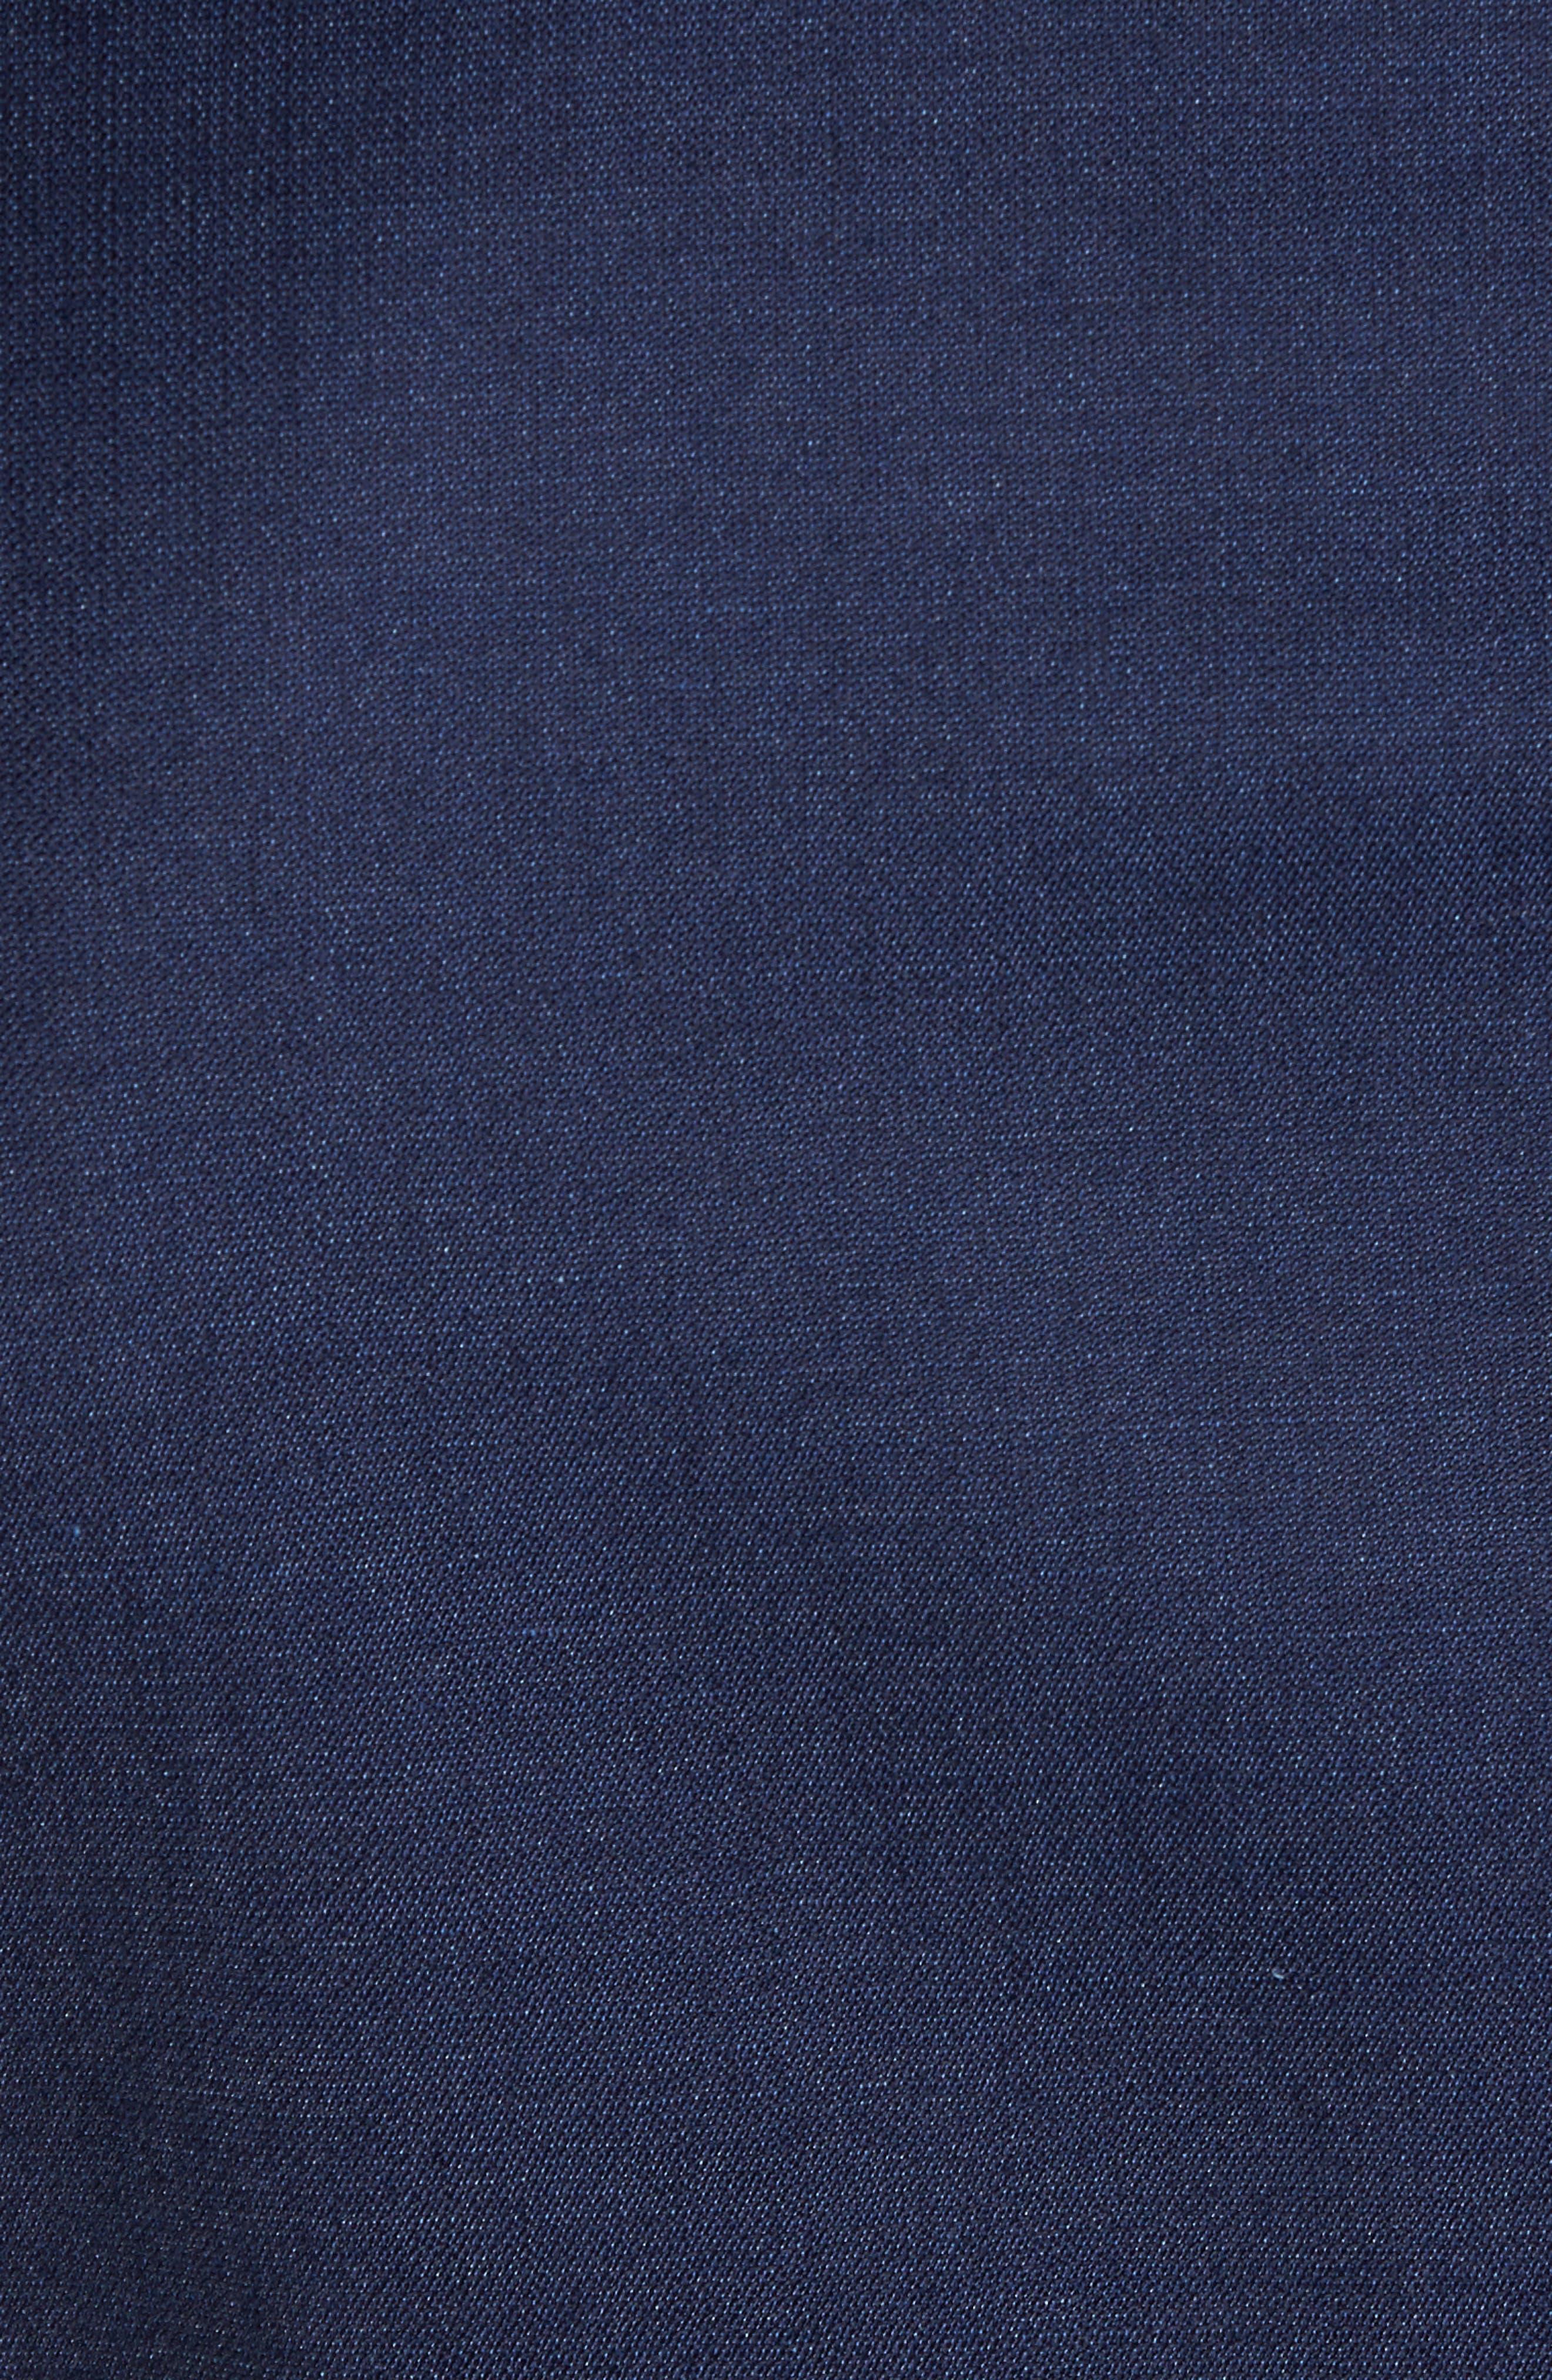 Jelvan/Livan Trim Fit Wool & Silk Tuxedo,                             Alternate thumbnail 7, color,                             Medium Blue